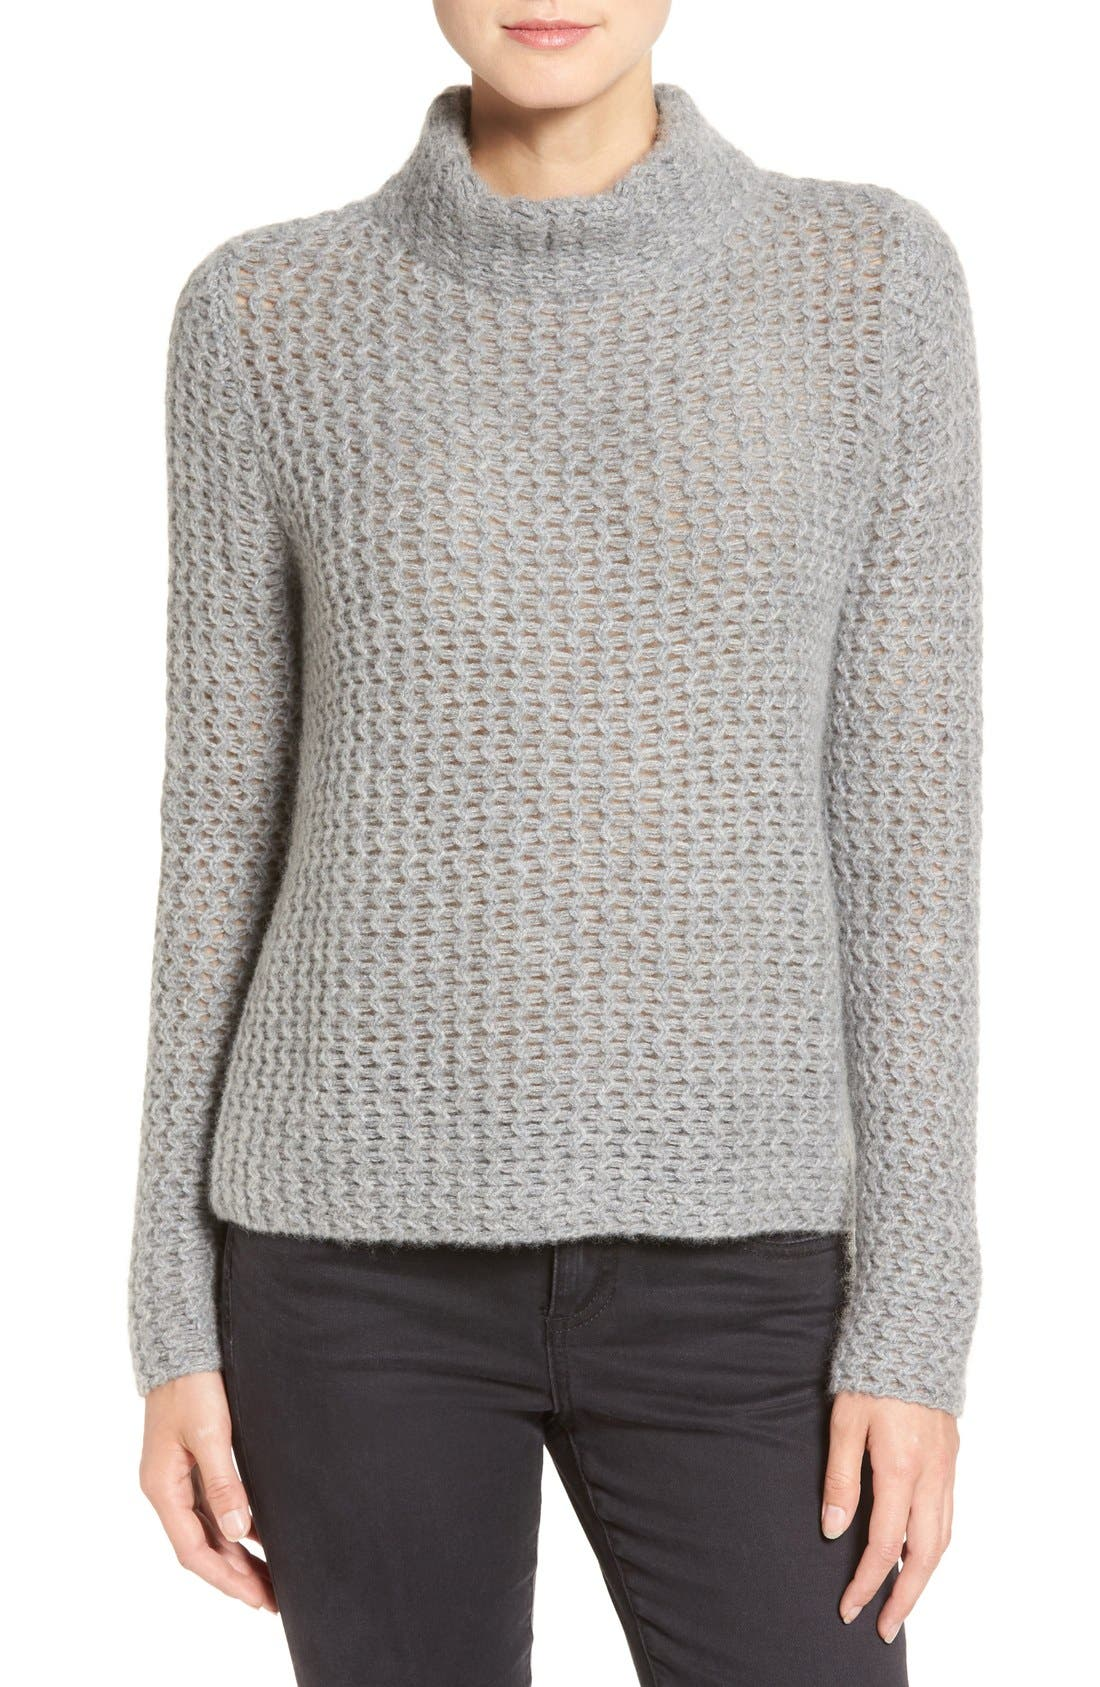 Alternate Image 1 Selected - Halogen® Stitch Detail Cashmere Mock Neck Sweater (Regular & Petite)